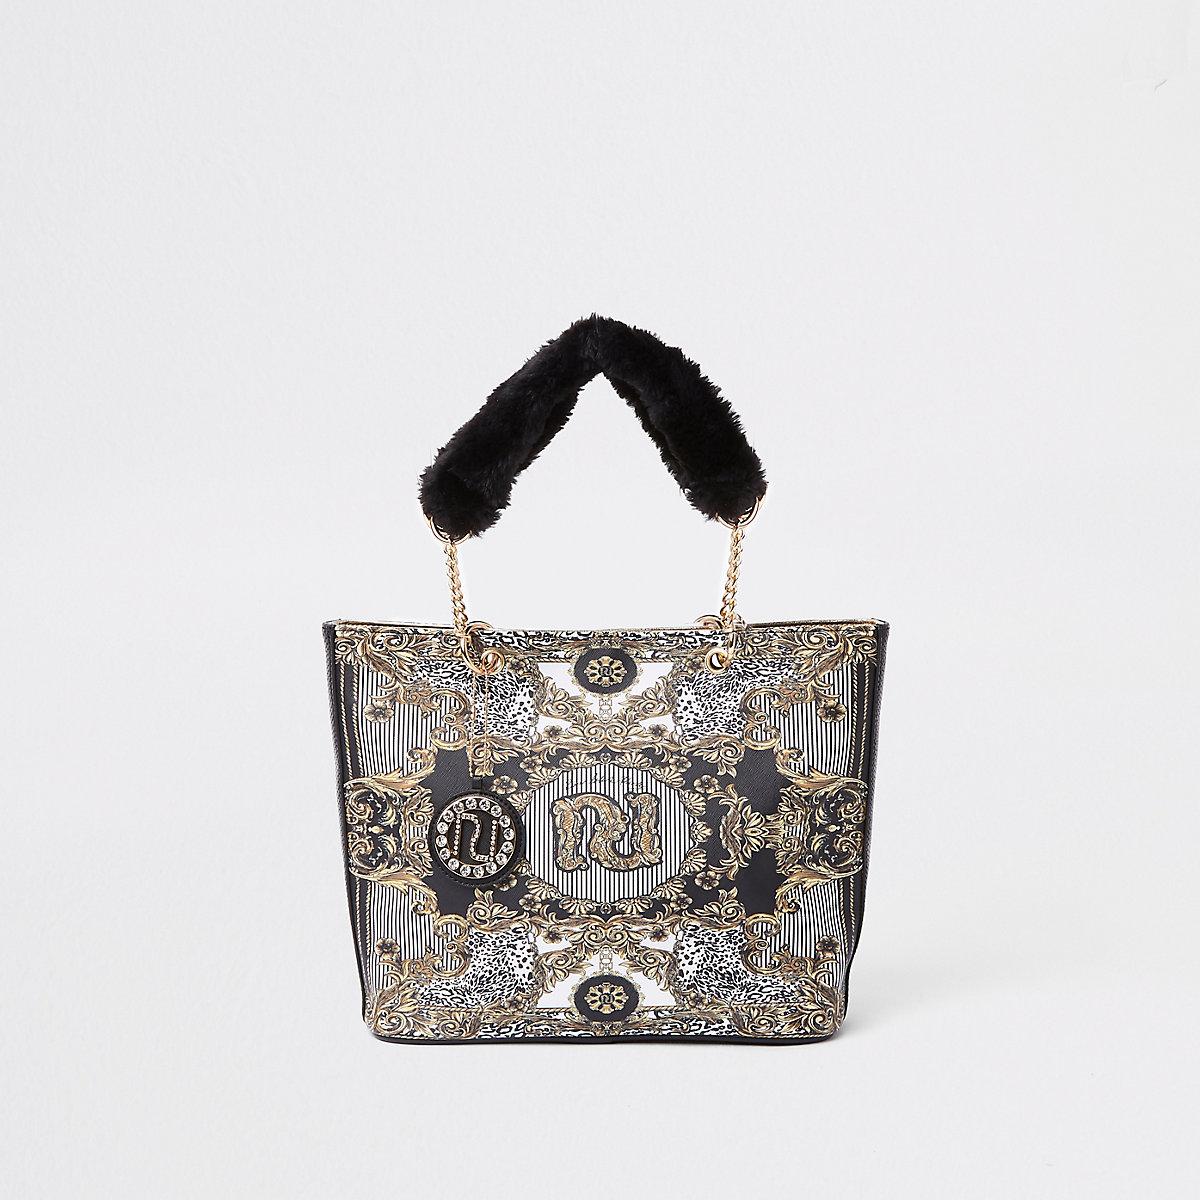 RI 30 girls black faux fur handle shopper bag